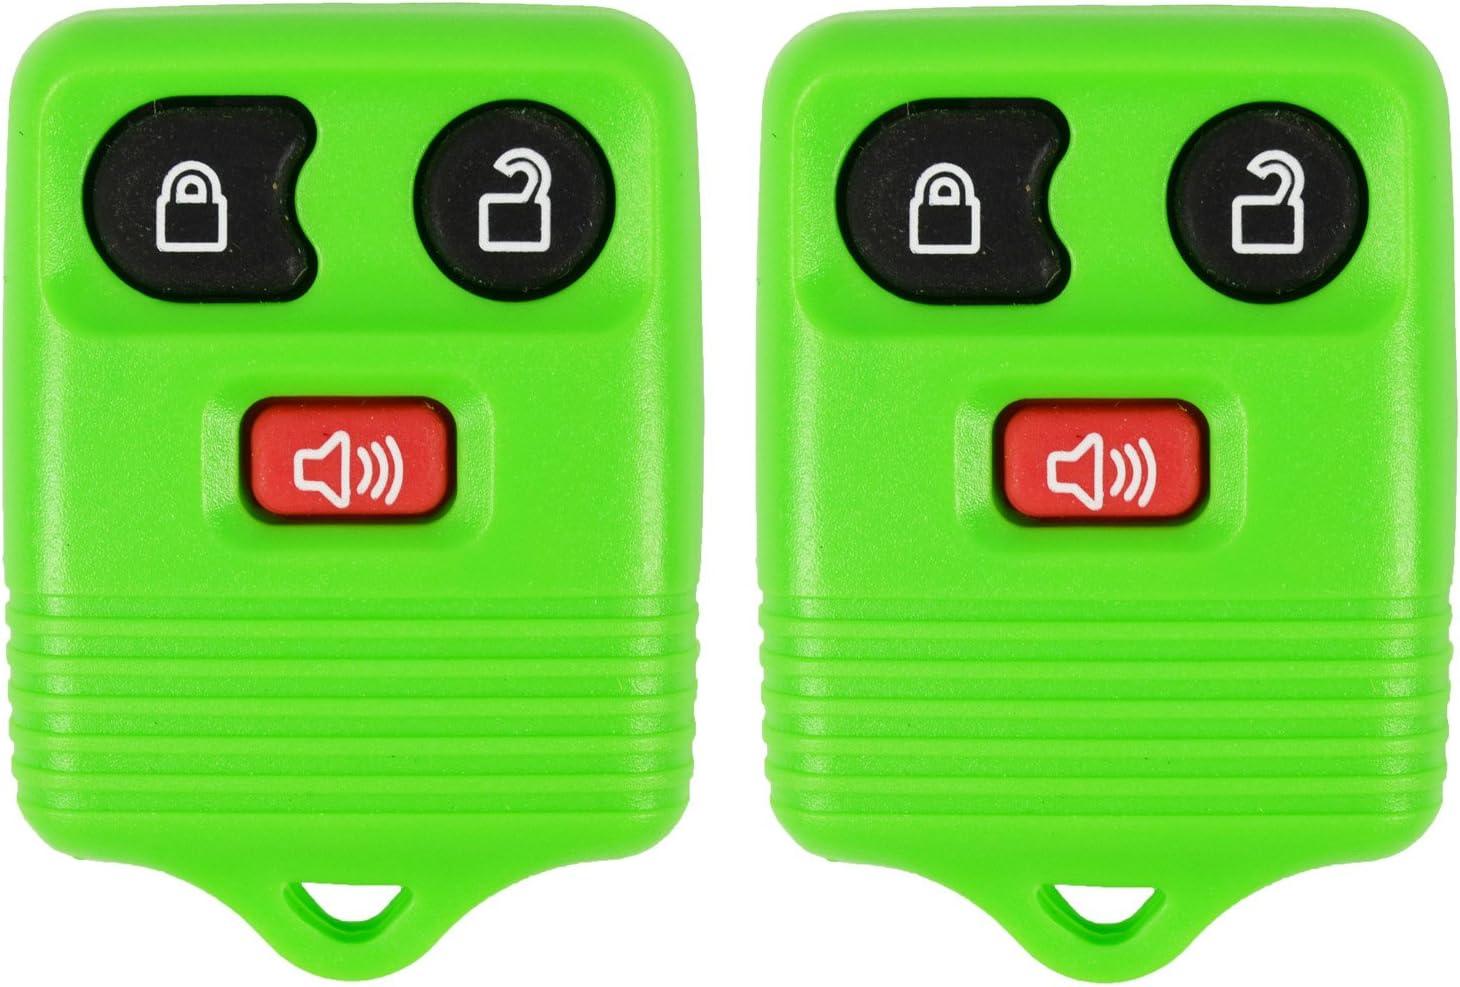 CWTWB1U331 FREE KEYTAG 2 Green QualityKeylessPlus Remote Replacement 3 Button Keyless Entry FCC ID